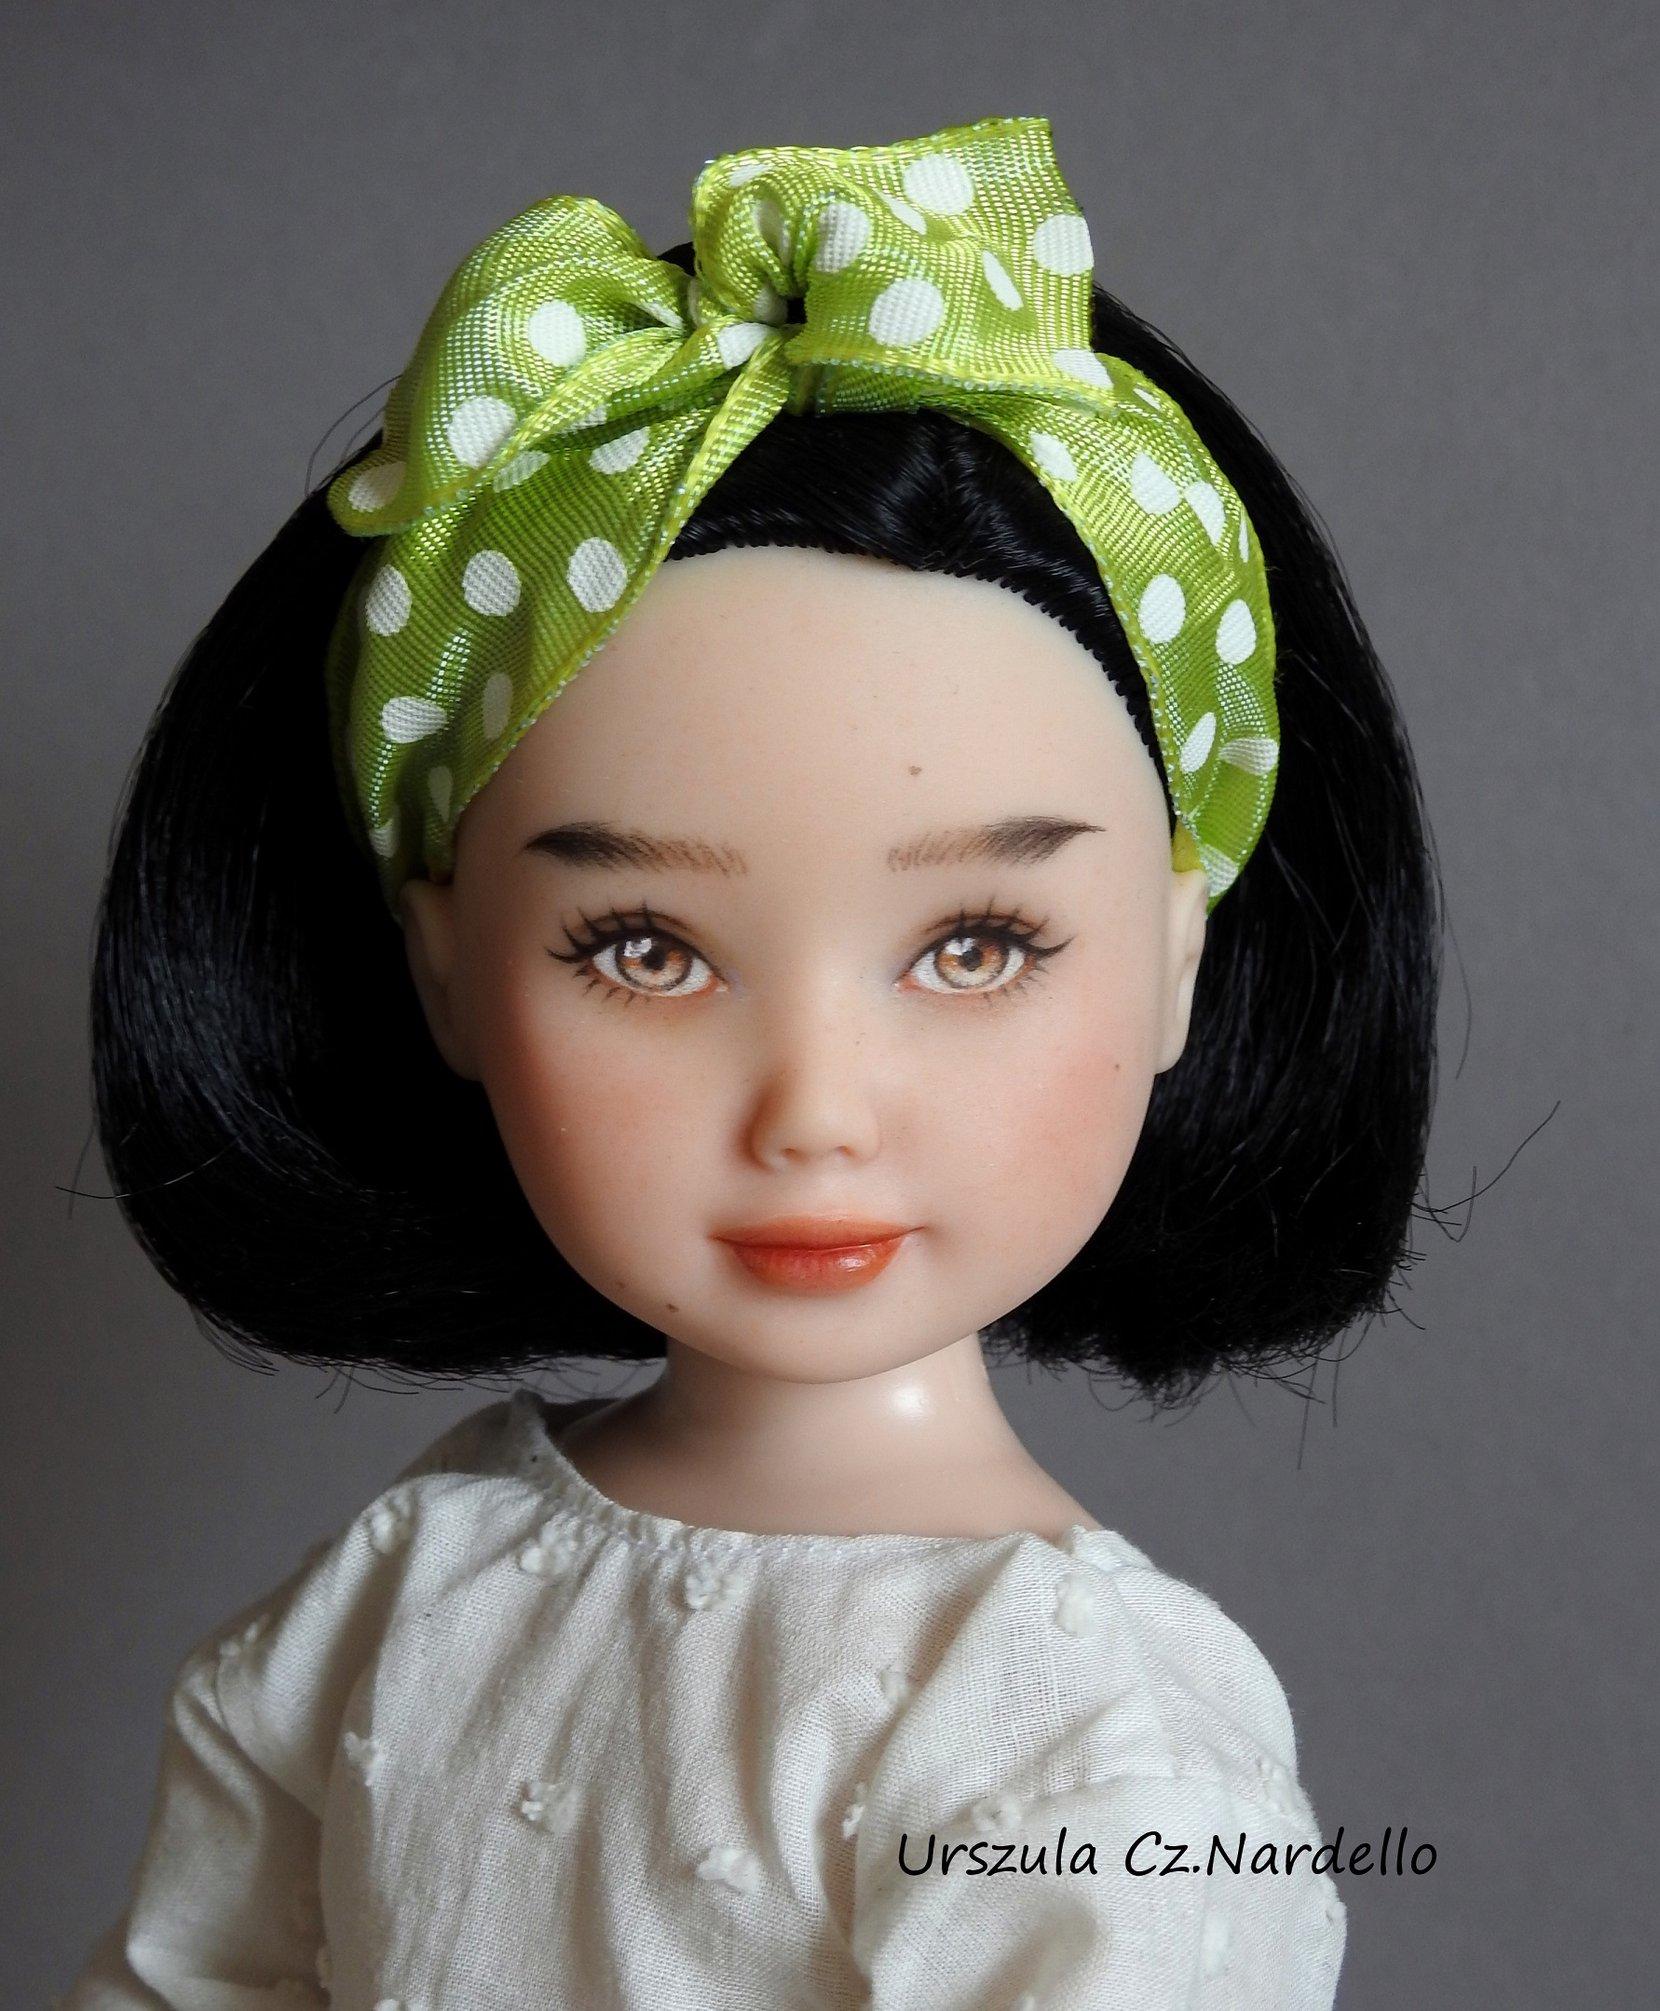 snow white-jolina ooak doll art painting